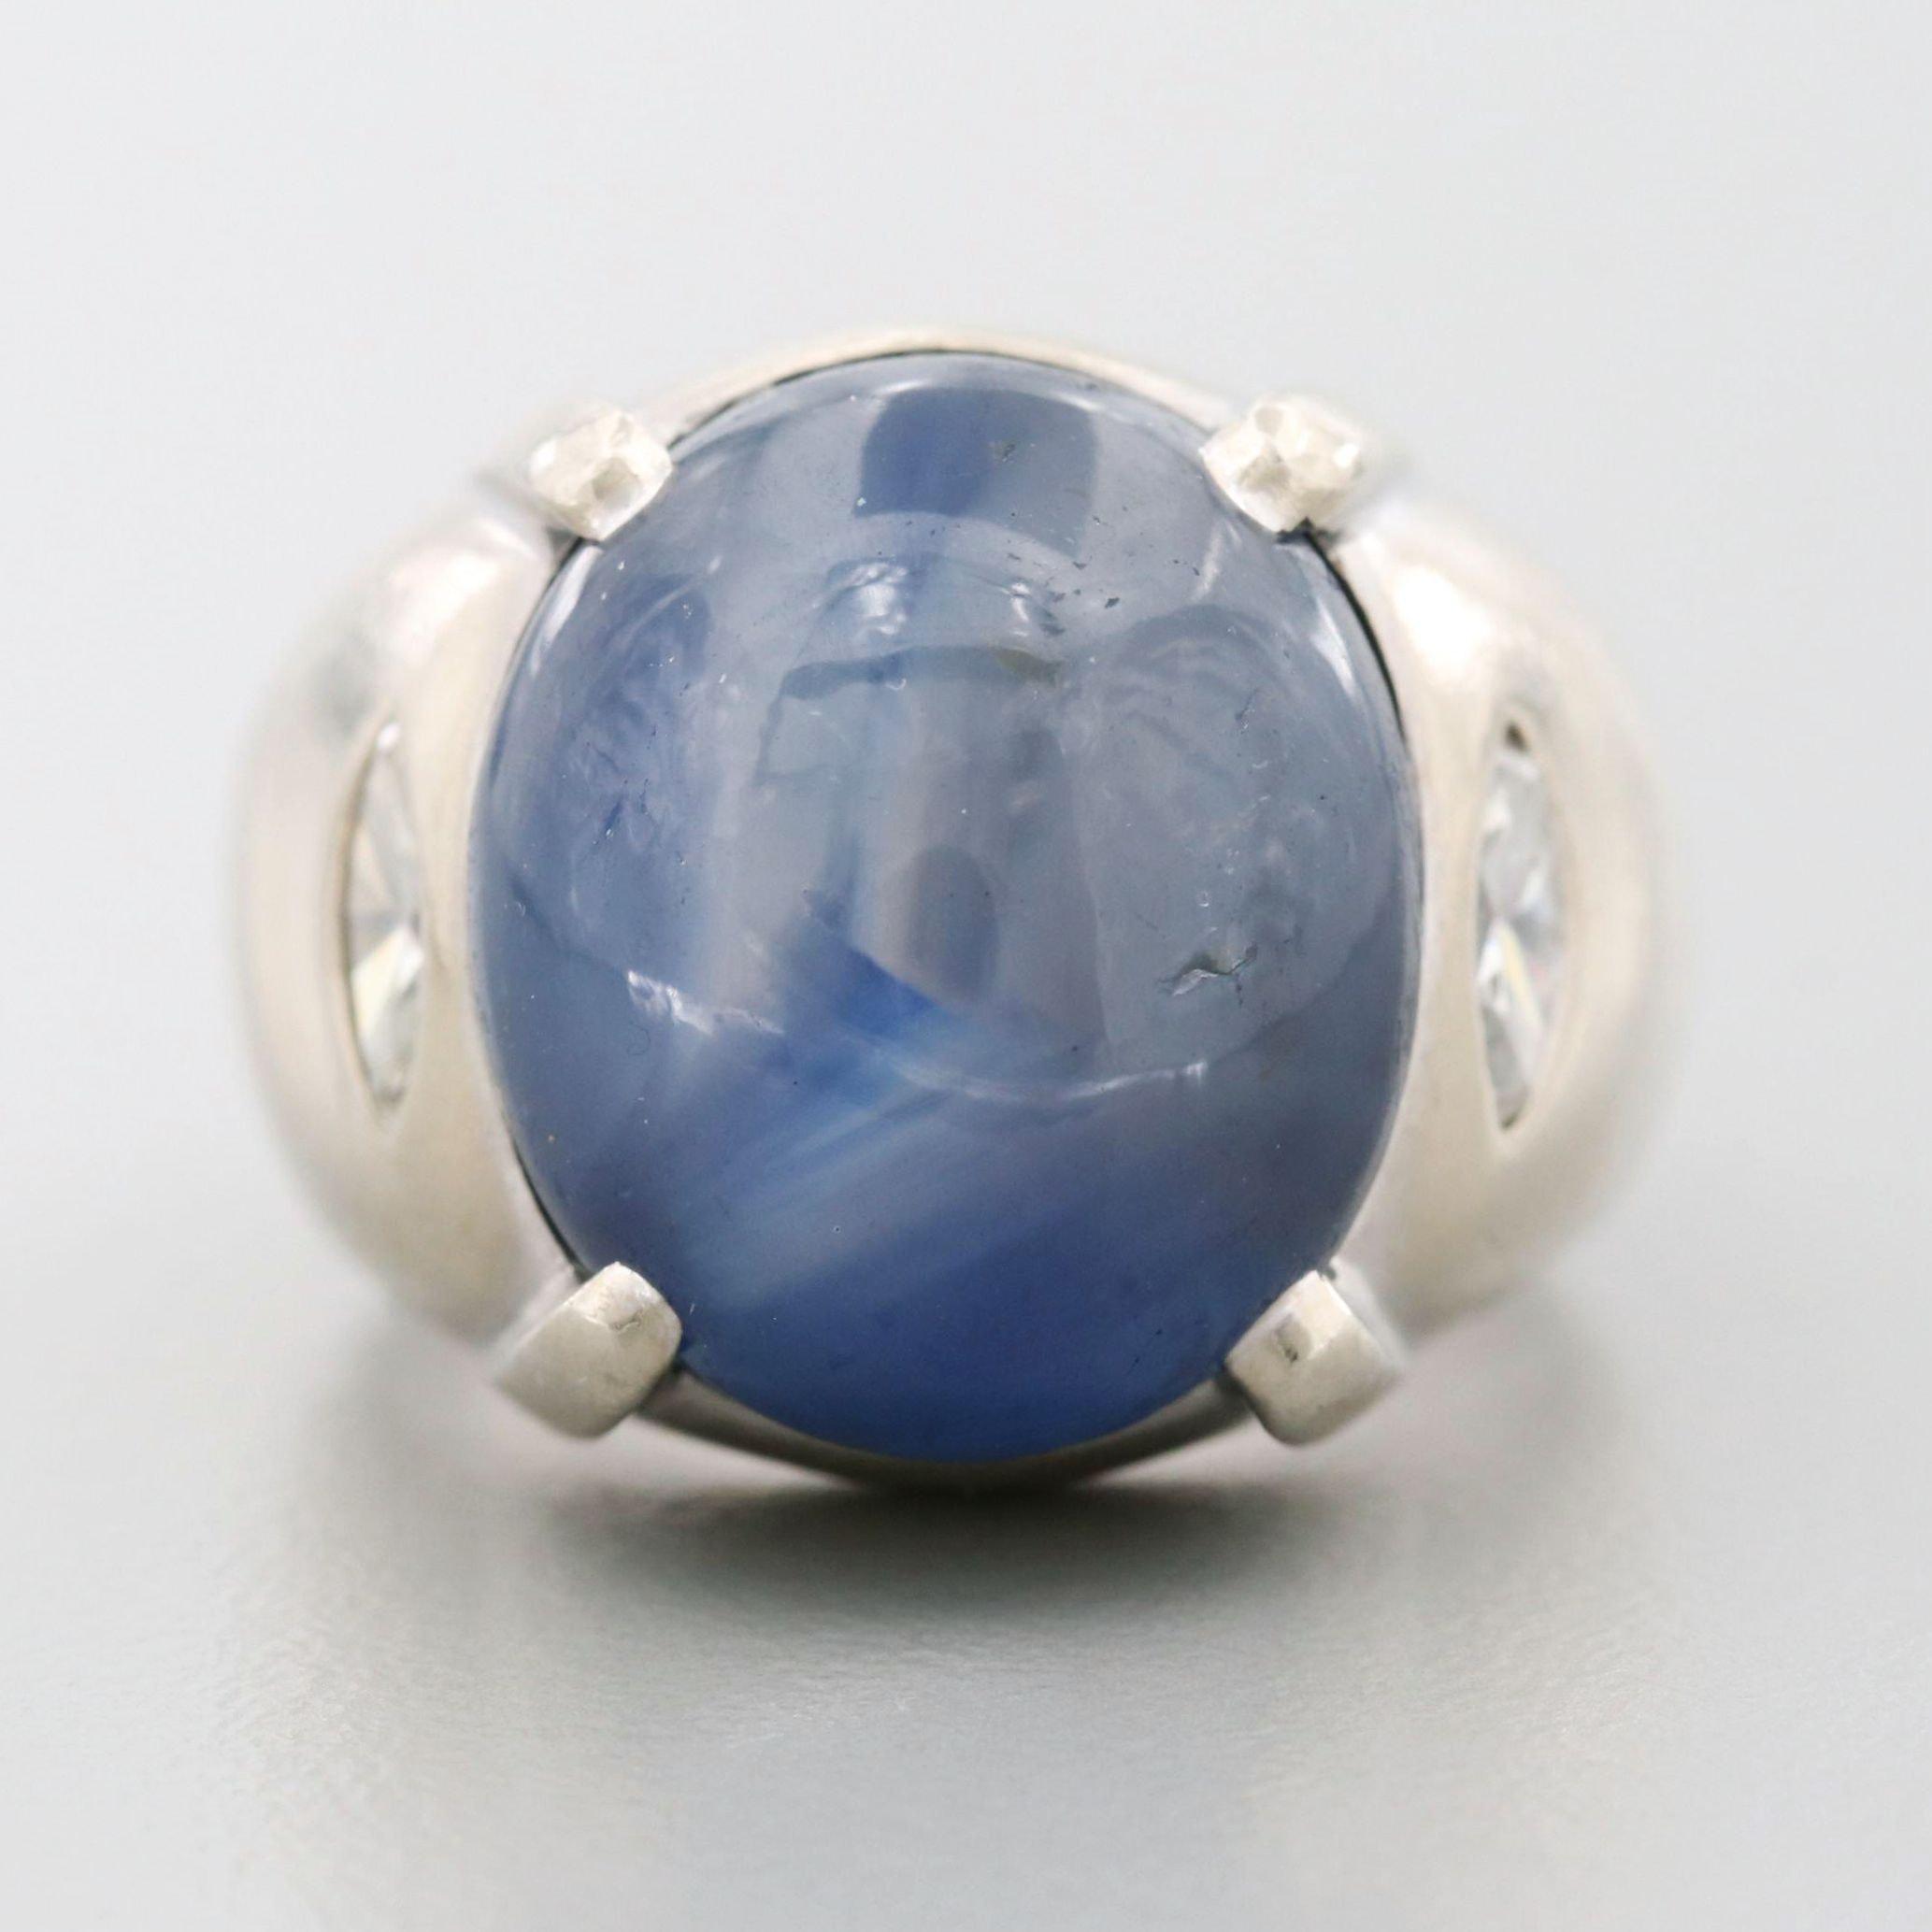 14K White Gold 20.31 CT Star Sapphire and Diamond Ring